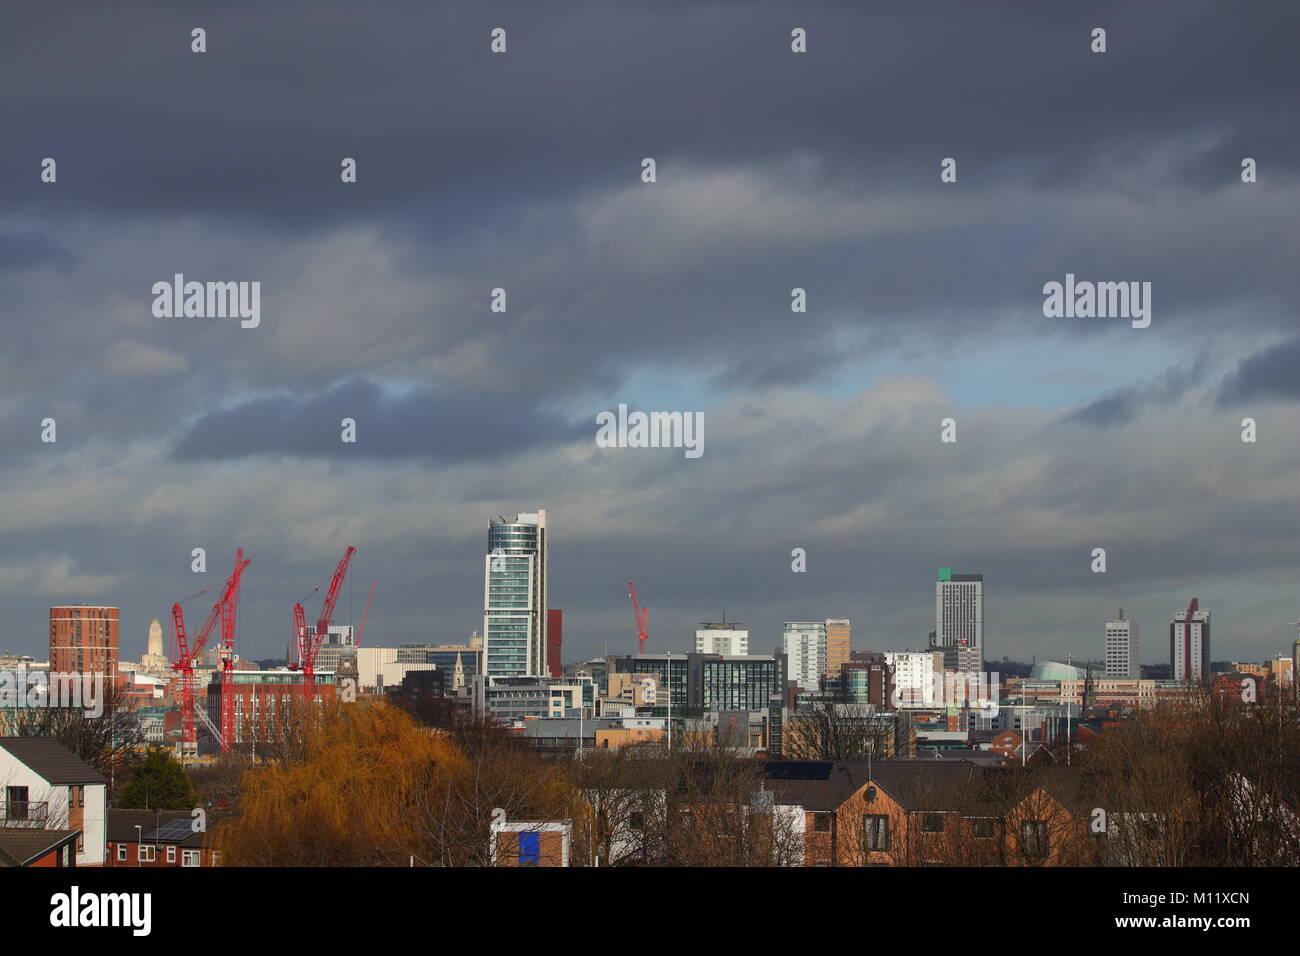 Leeds Skyline - Stock Image